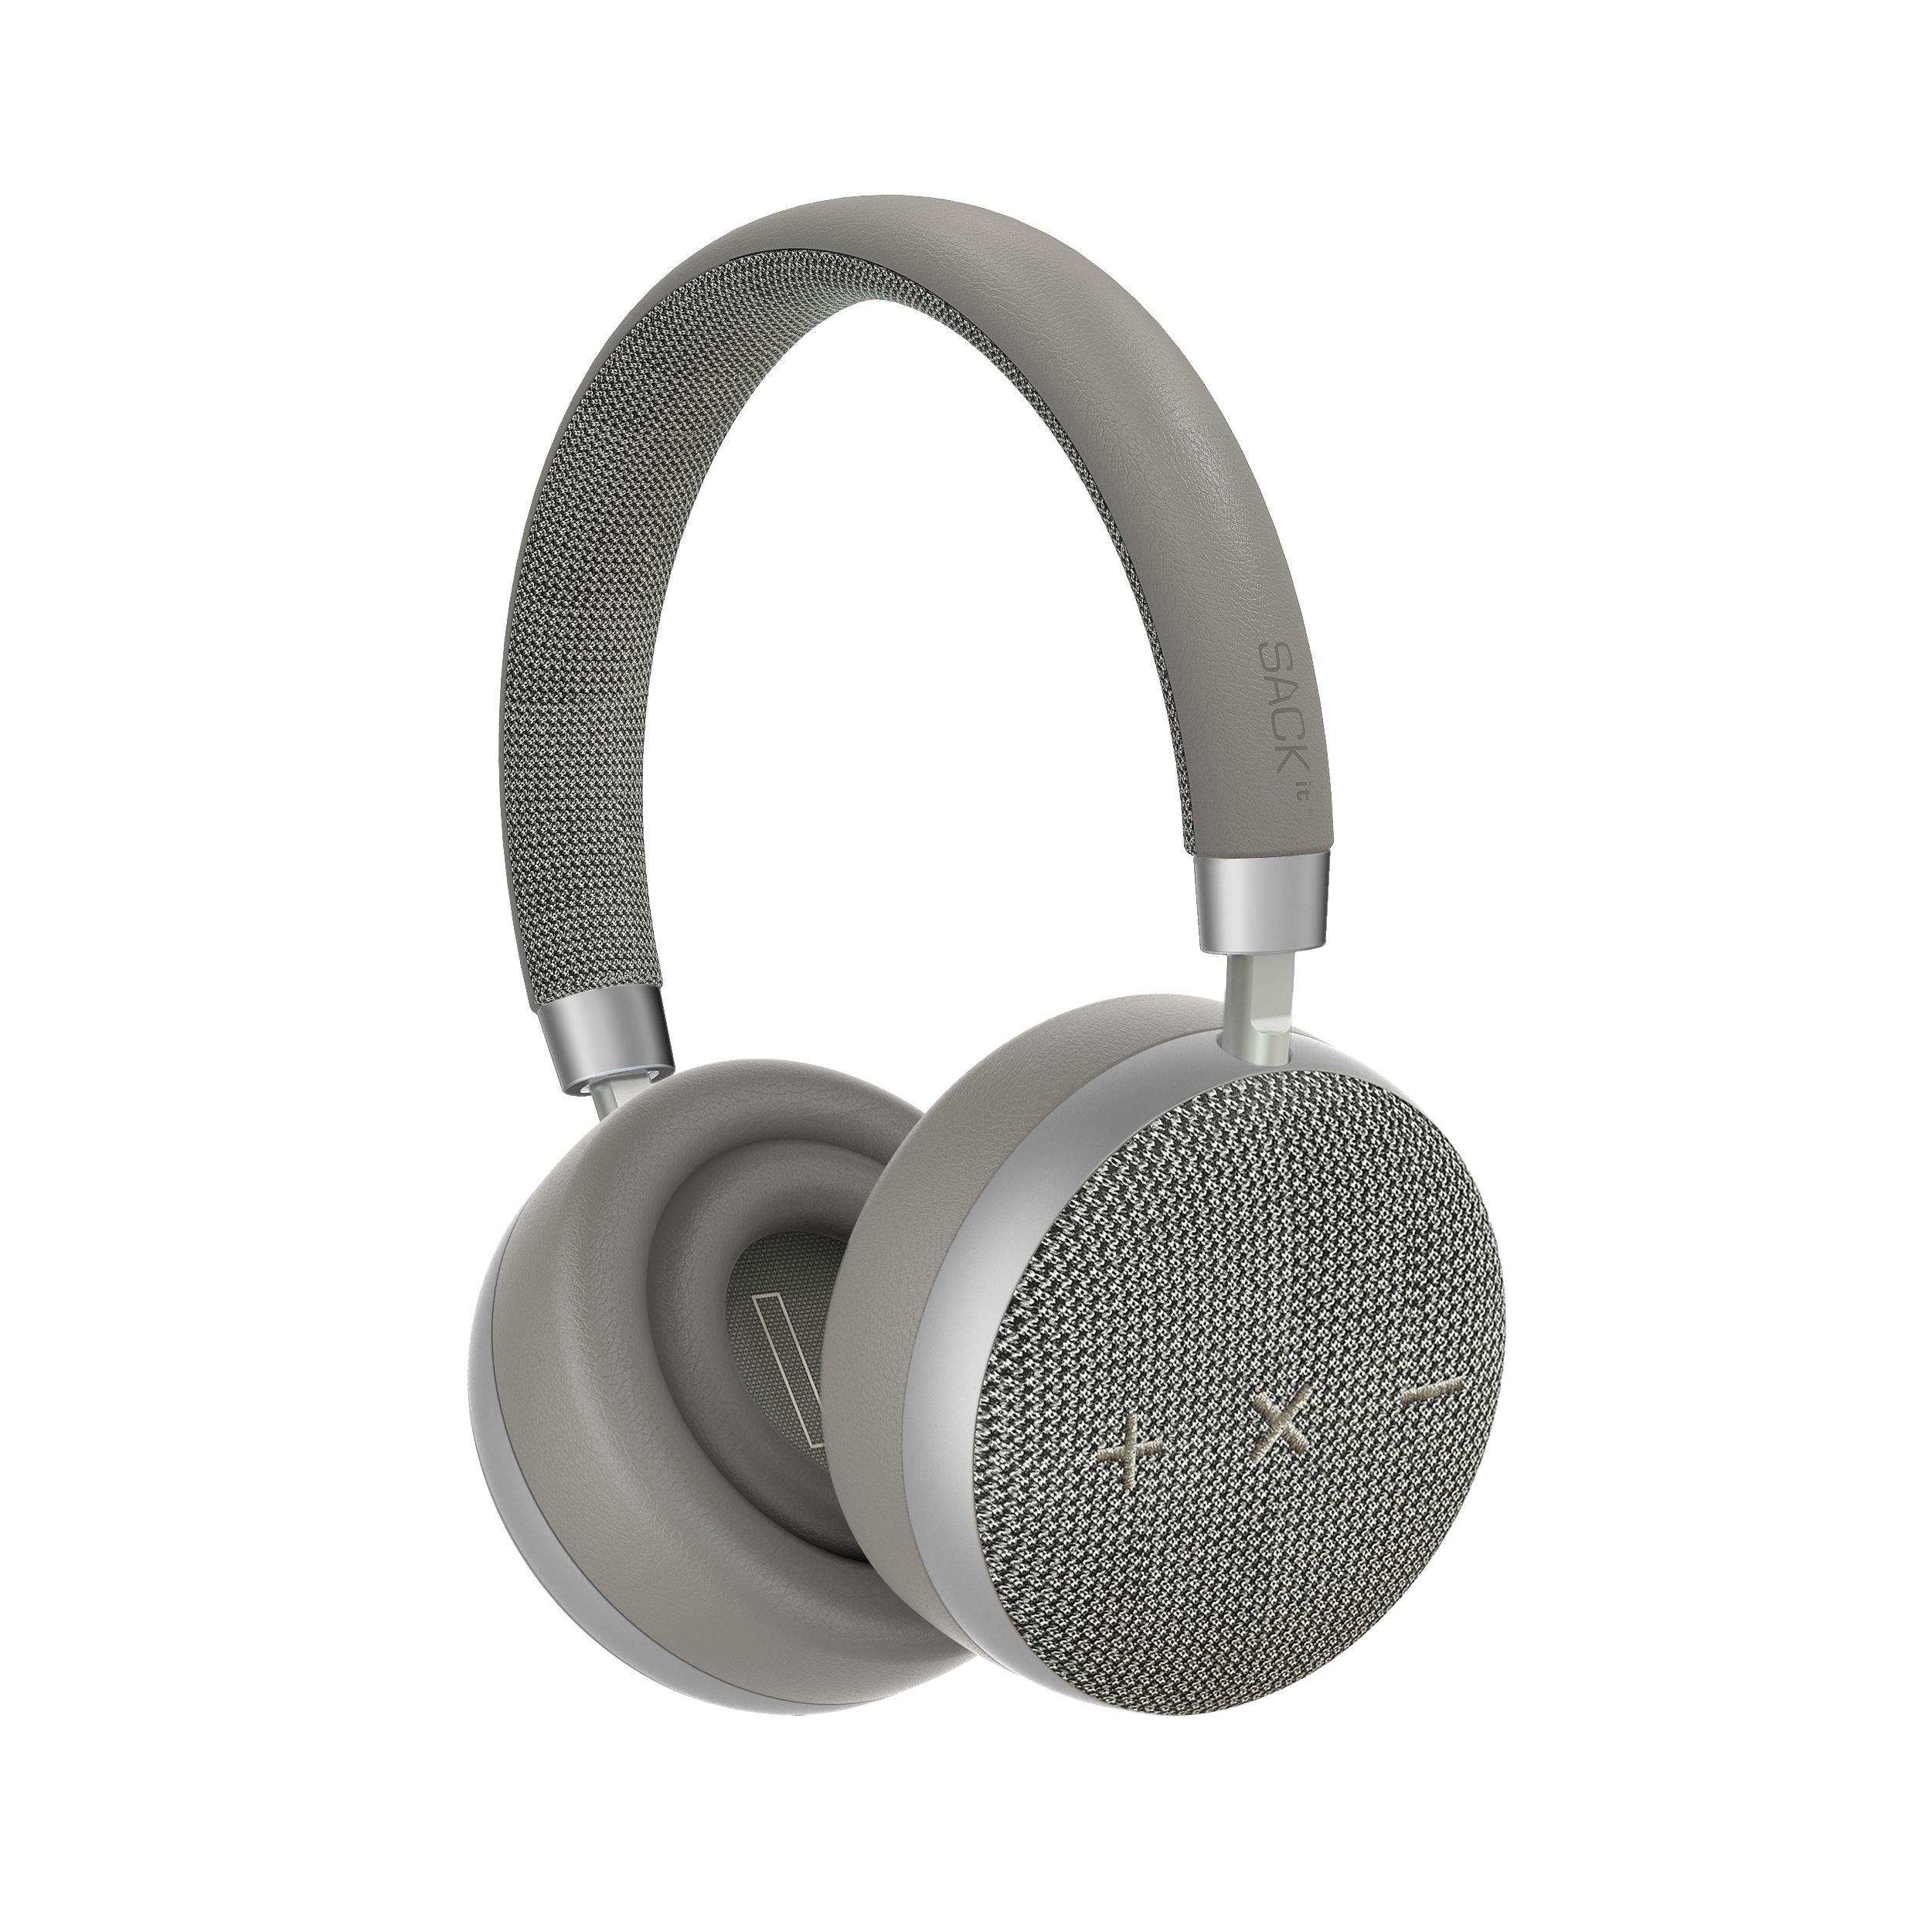 SACKit - TOUCHit S On-Ear Headphones - Silver